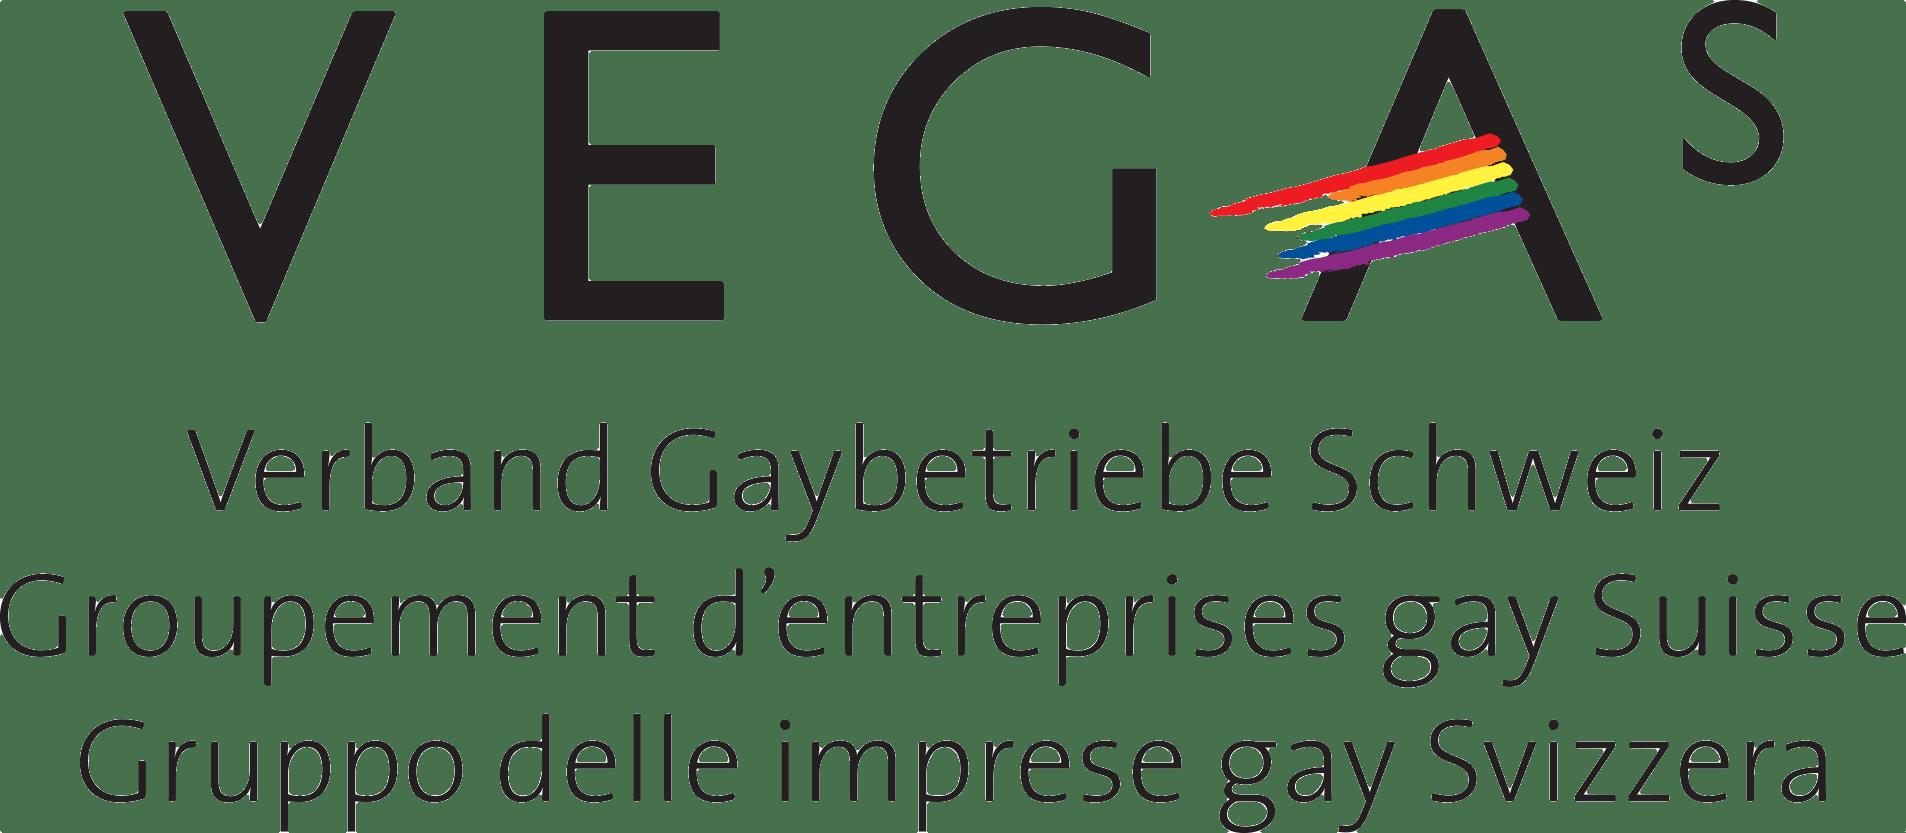 Vegas | Verband Gay Betriebe Schweiz